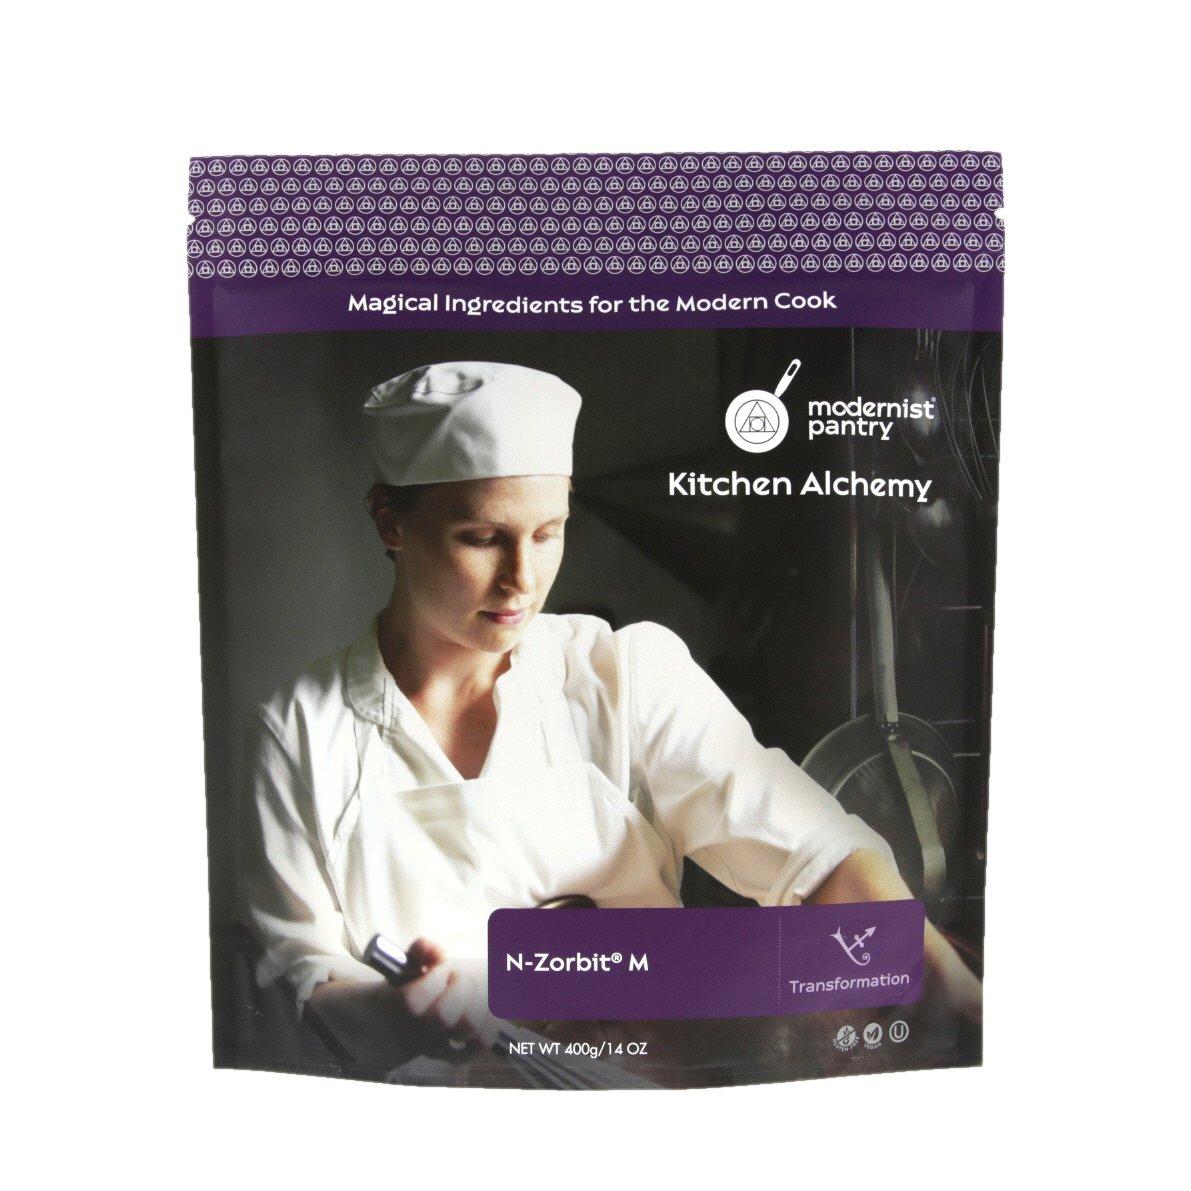 N-Zorbit - Food Grade Tapioca Maltodextrin (Molecular Gastronomy) ⊘ Non-GMO ☮ Vegan ✡ OU Kosher Certified - 400g/14oz